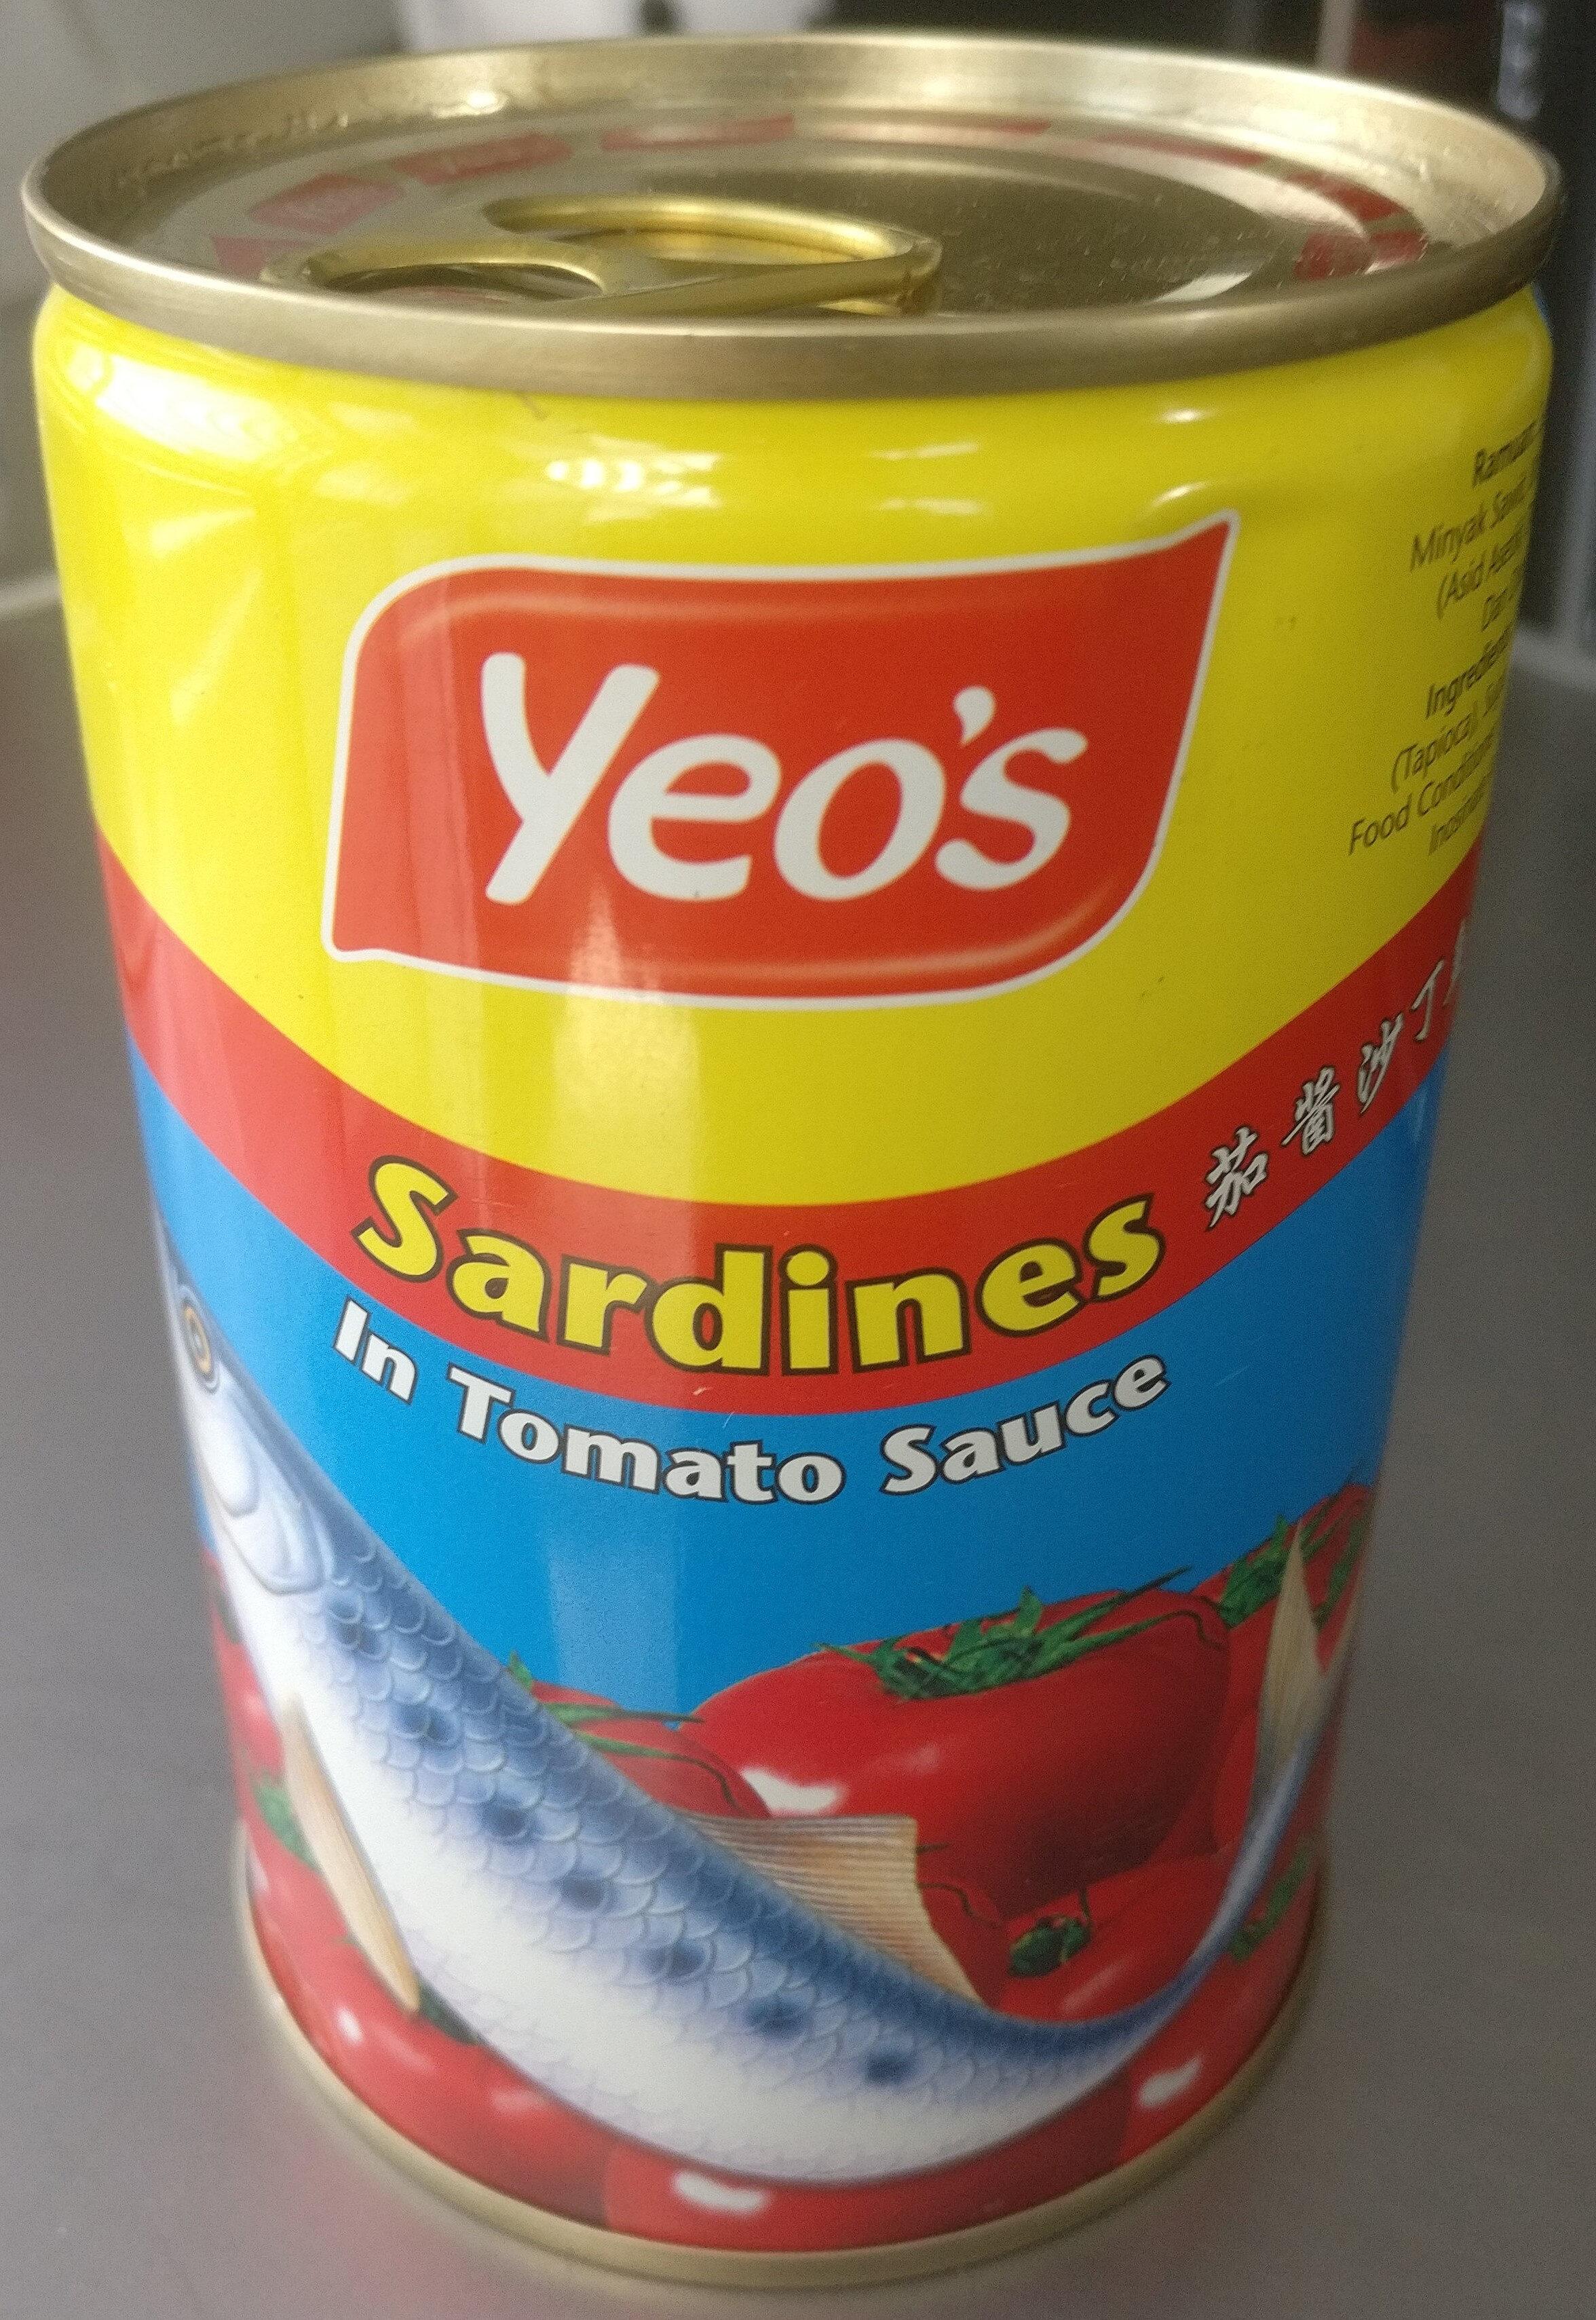 Sardines in Tomato Sauce - Product